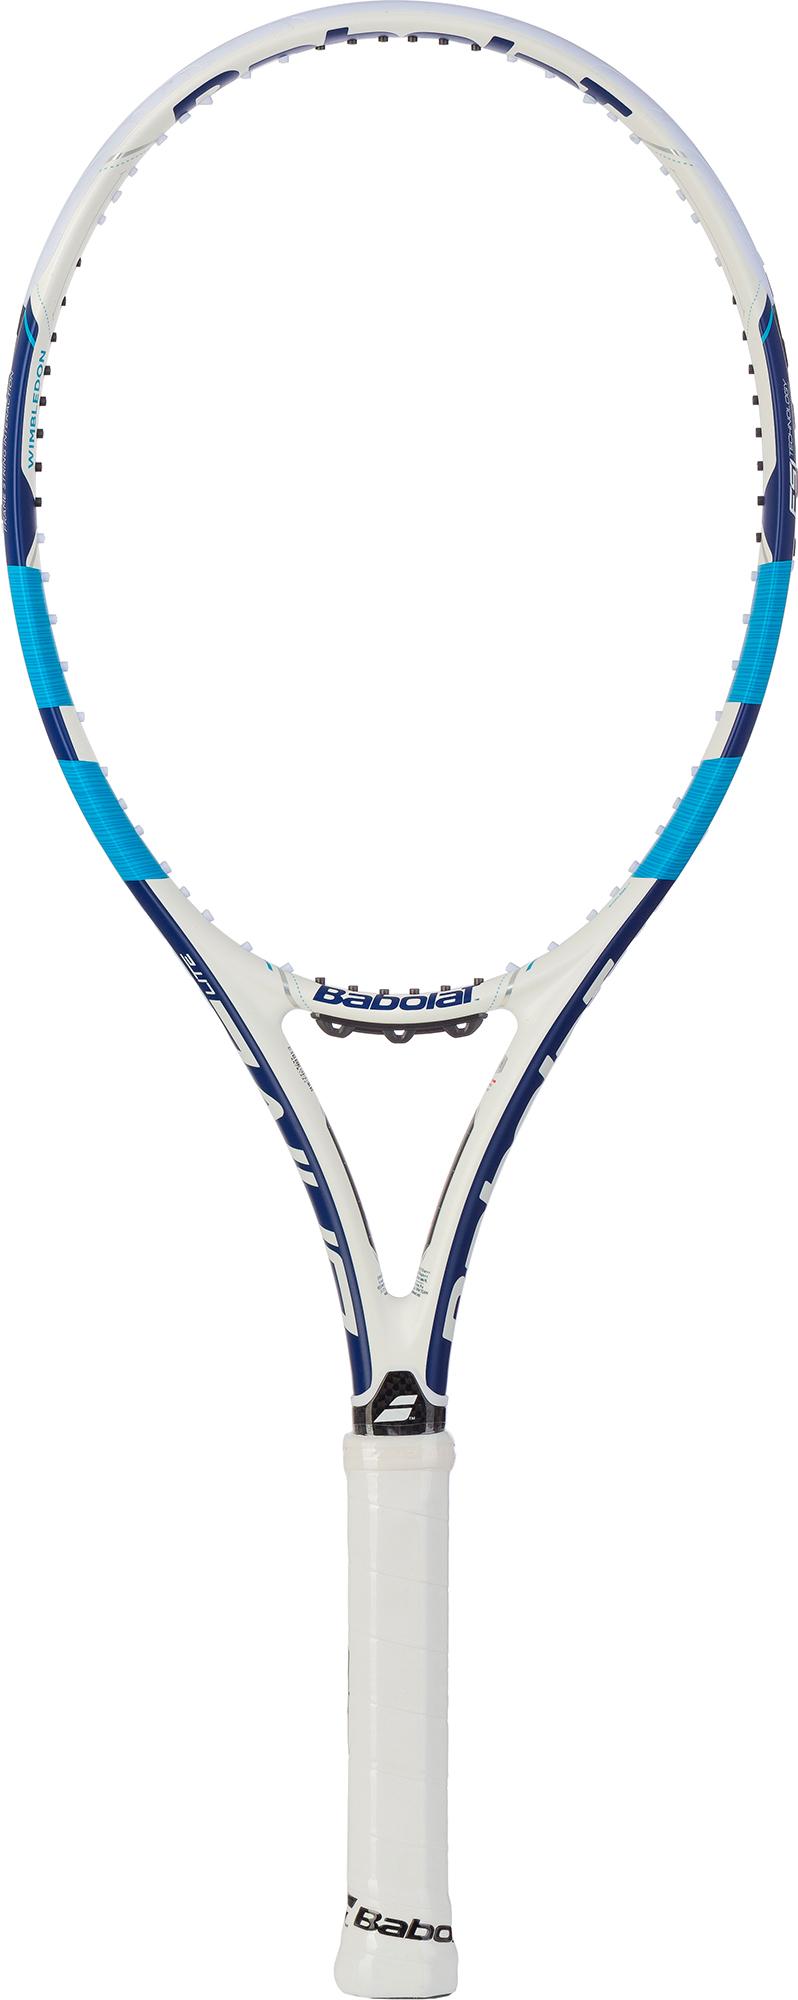 Babolat Ракетка для большого тенниса Babolat PURE DRIVE LITE WIM babolat ракетка для большого тенниса babolat pure strike team размер 3